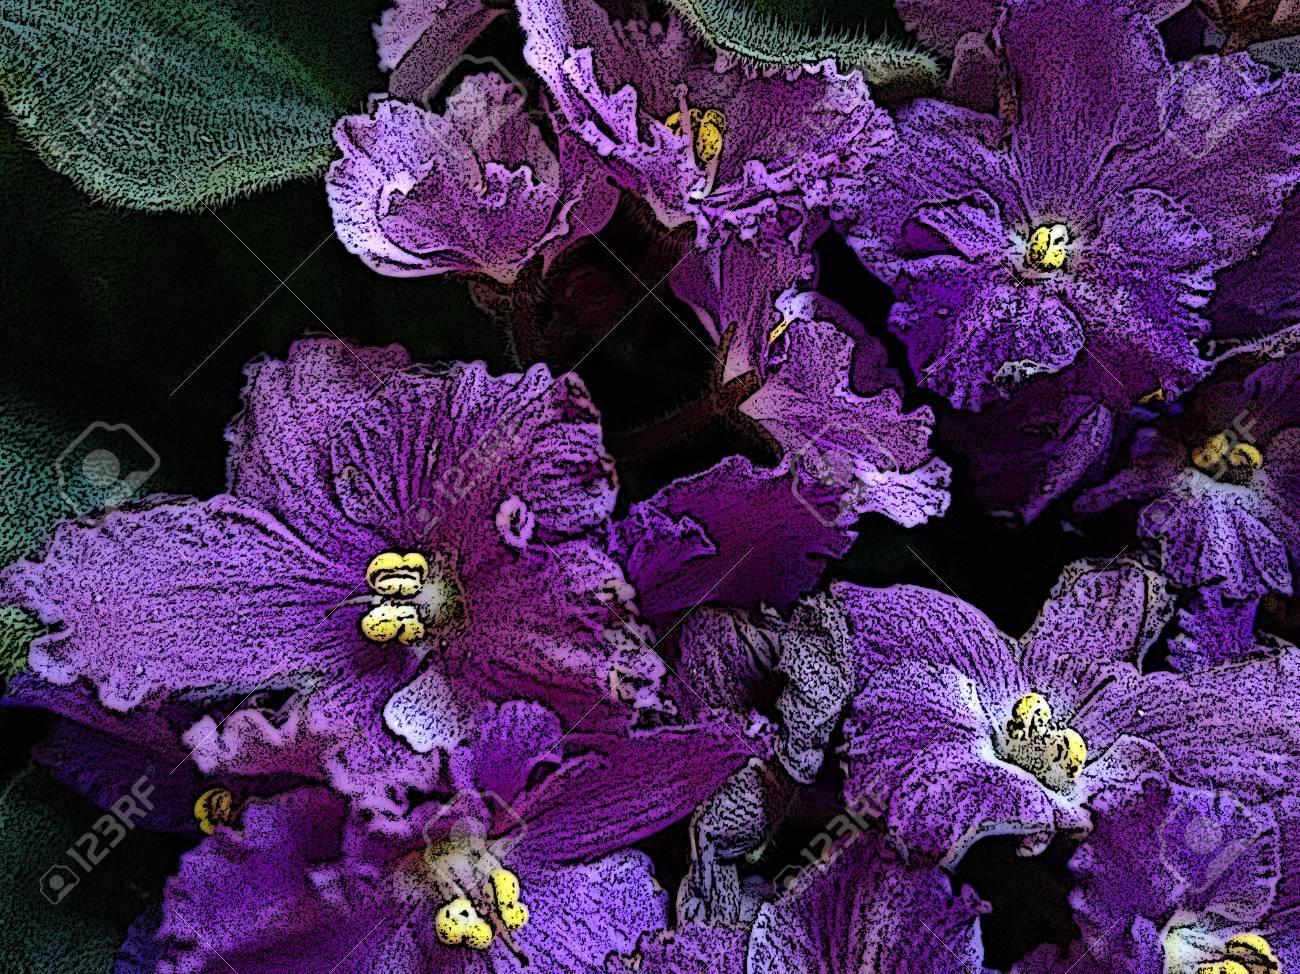 Exceptional Fiore Viola Africano   Viola   La Viola Africana è Una Pianta Erbacea Di  Regioni Temperate, In Genere Con Fiori A Cinque Petali Viola, Blu, Rosa O  Bianco, ...